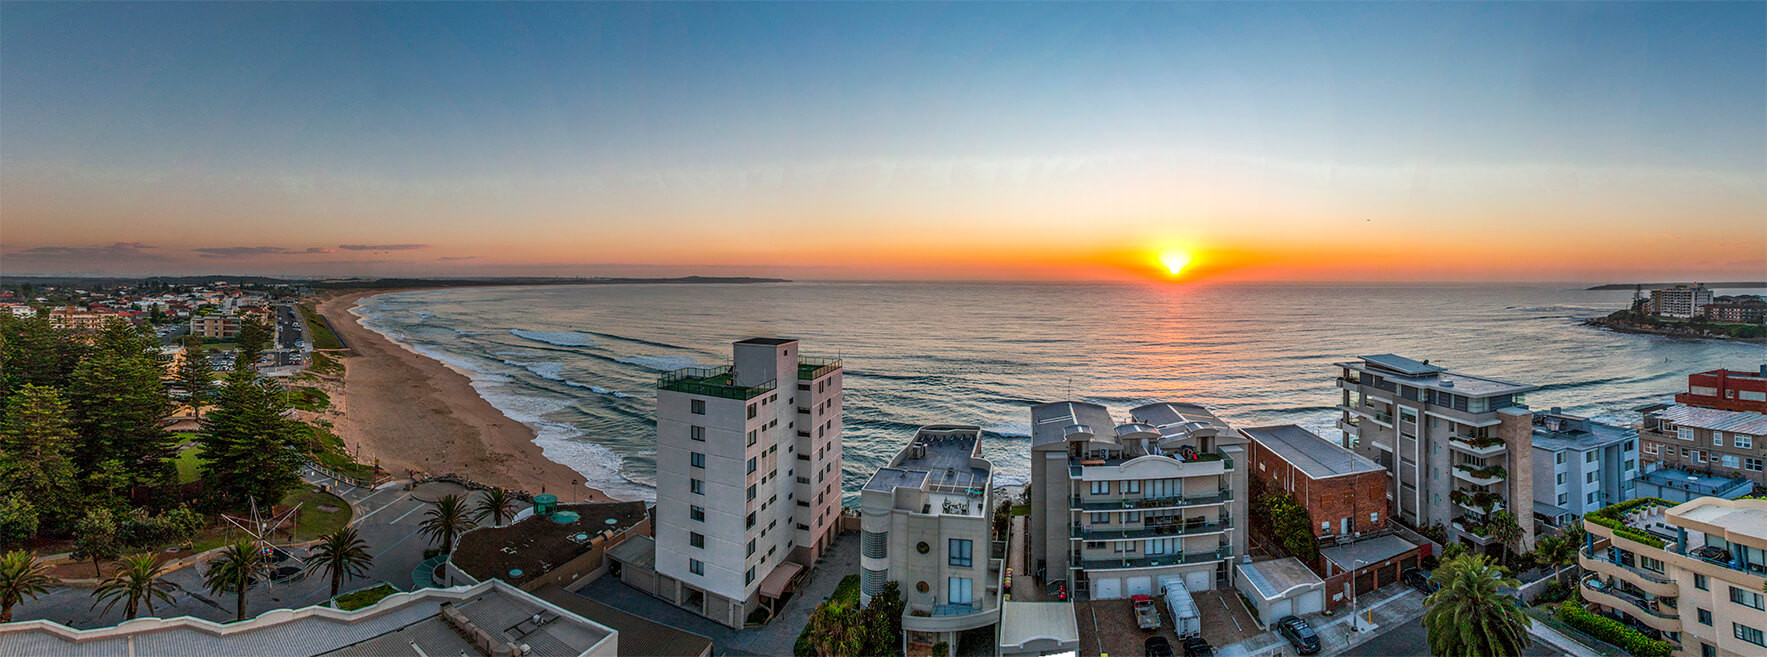 Australia - Syndey, Cronulla Beach